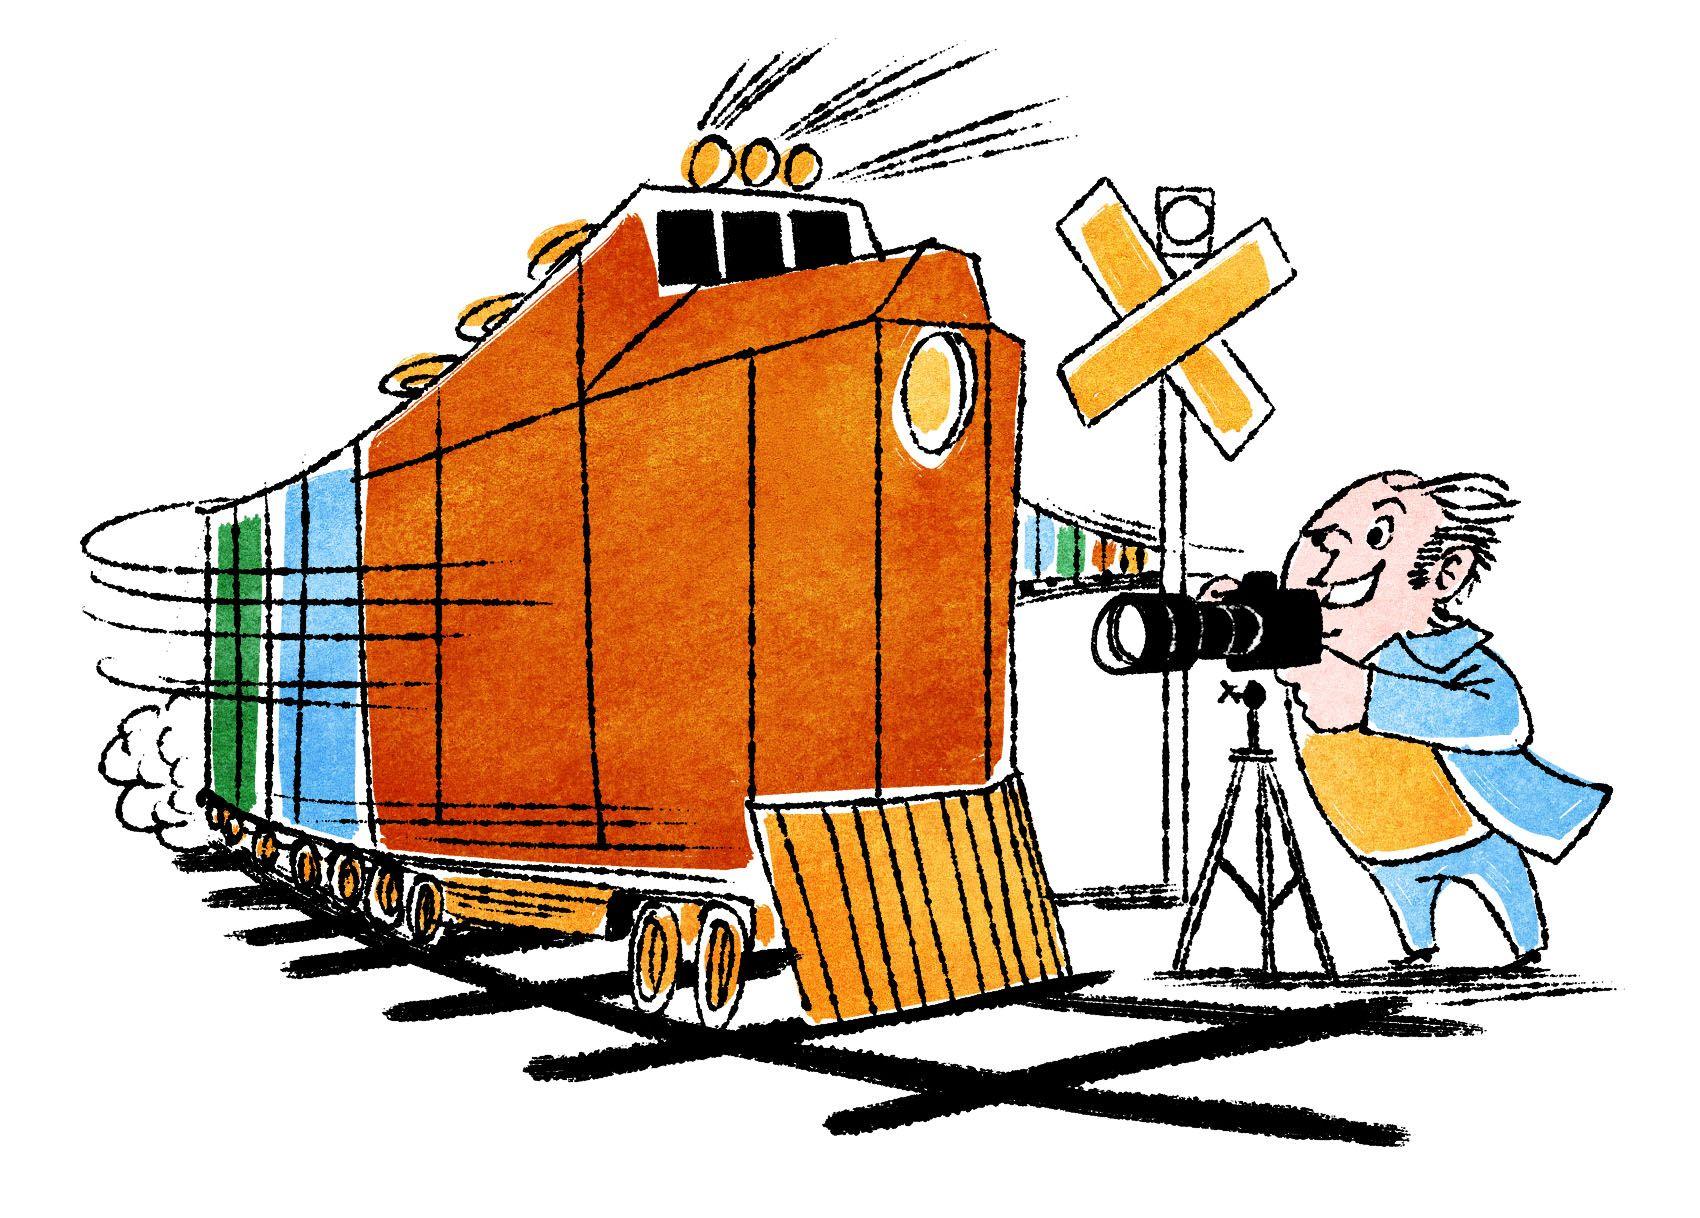 expanded ho scale train set model railroad track plan railroad rh pinterest co uk